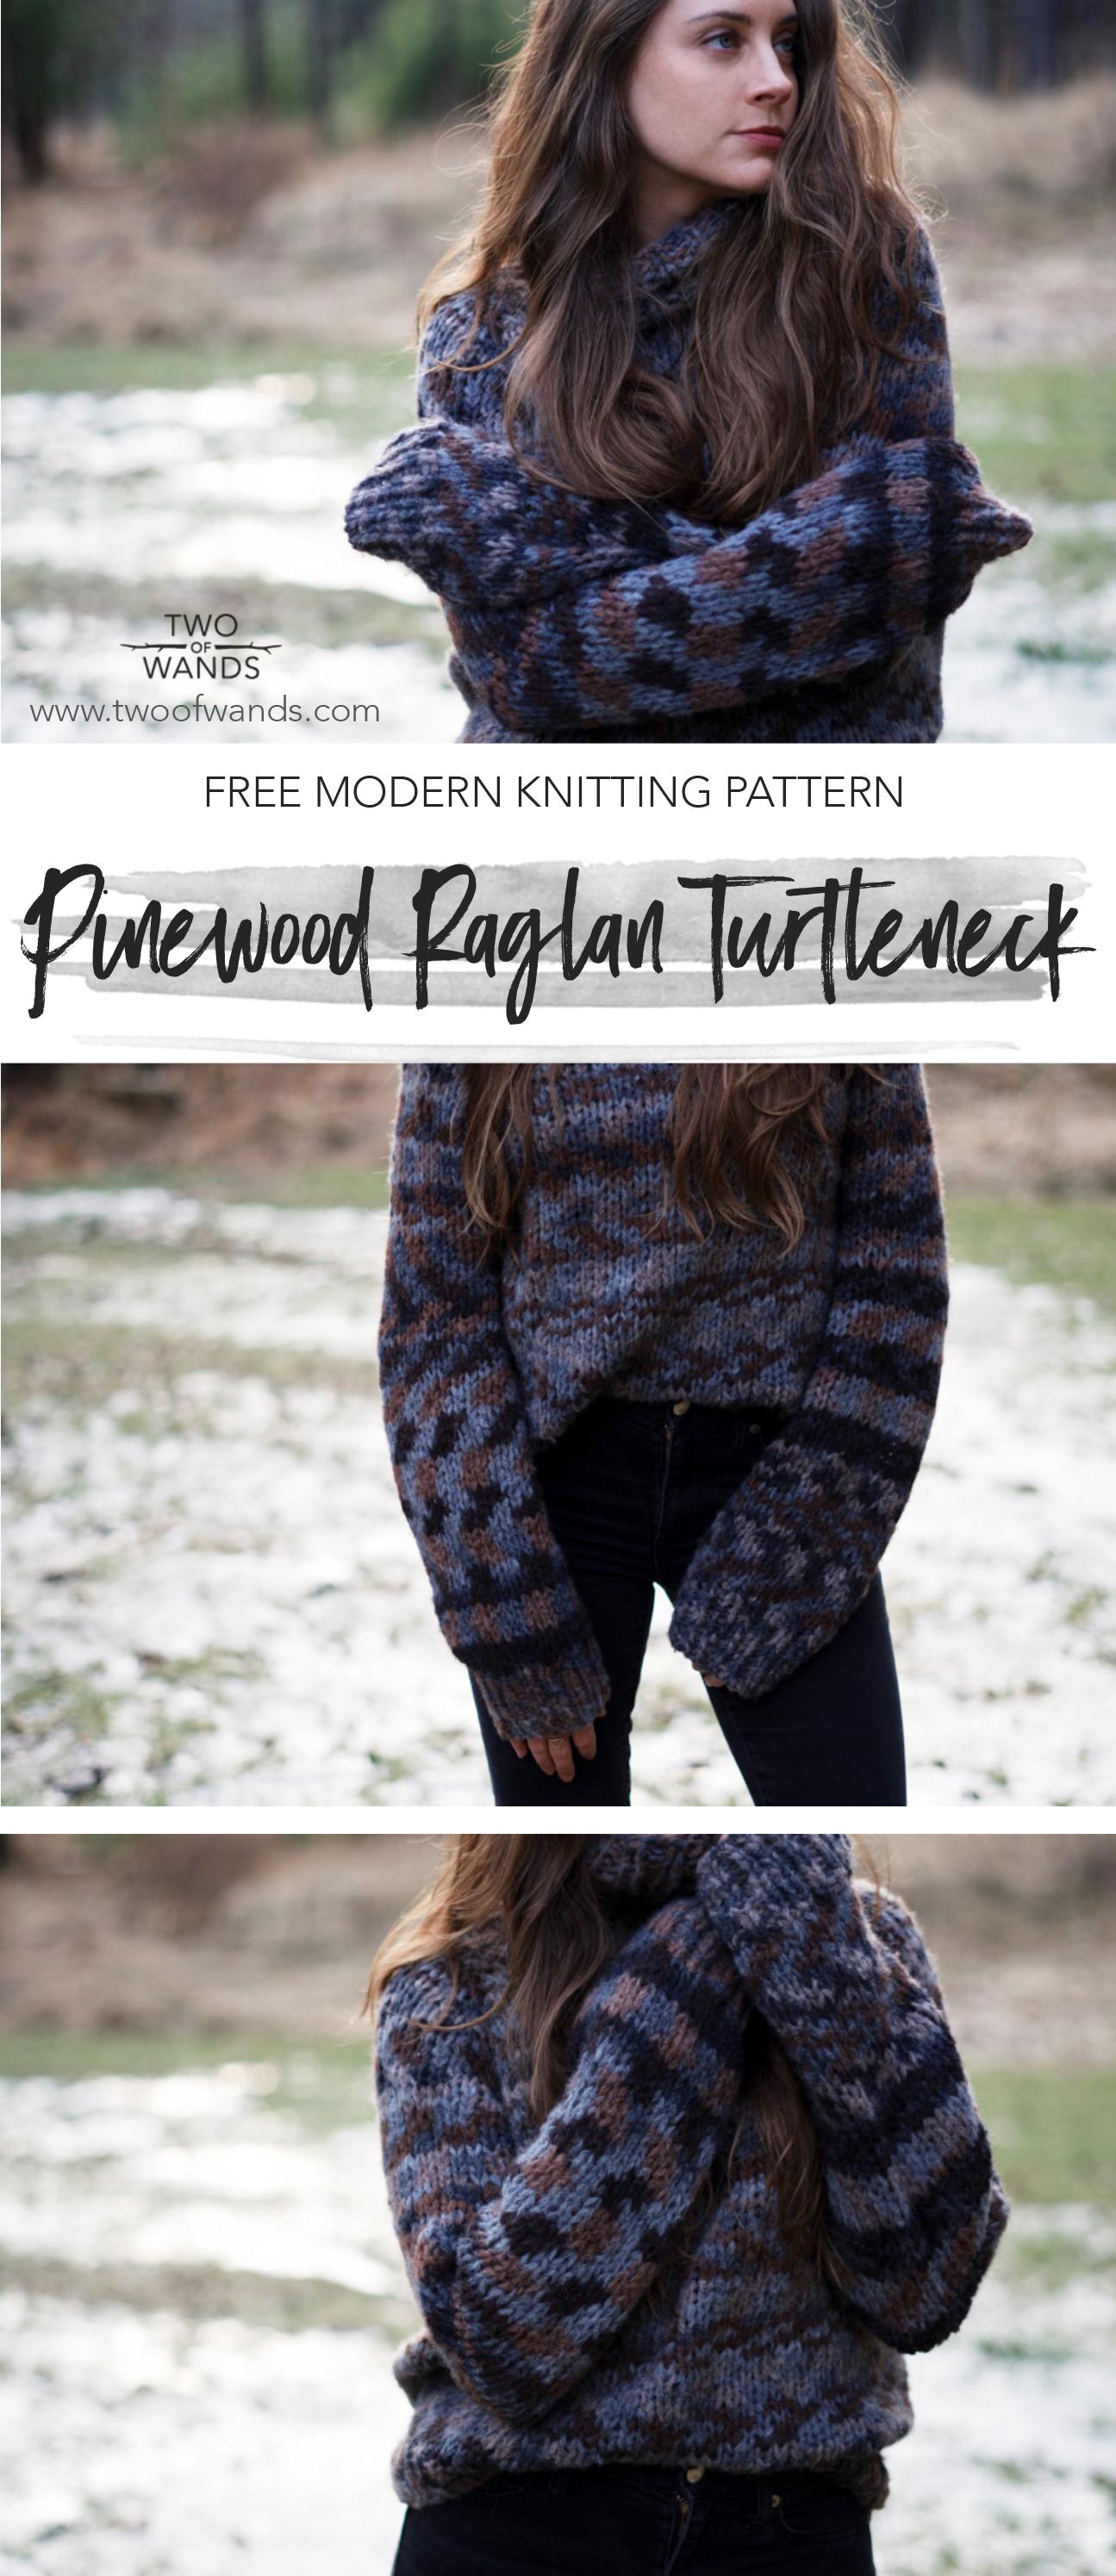 Pinewood Raglan Turtleneck pattern by Two of Wands